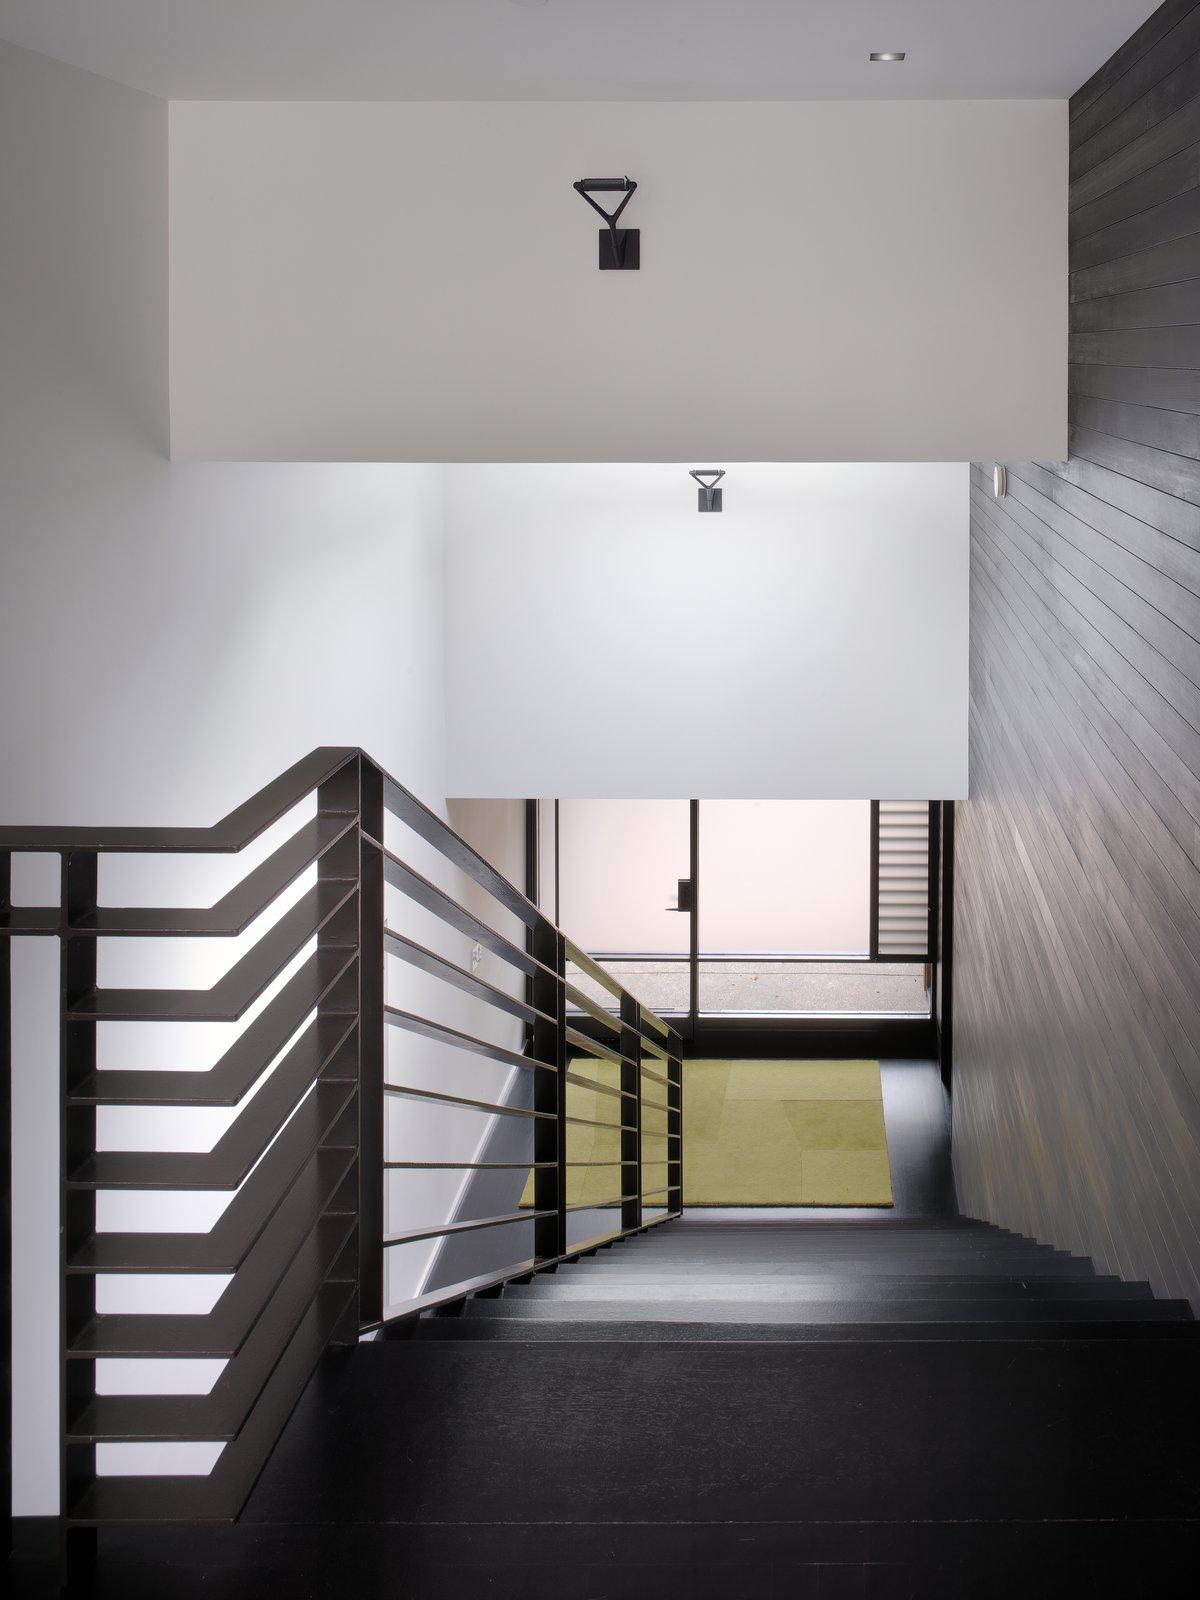 Stair hall  MV House by Chris Deam